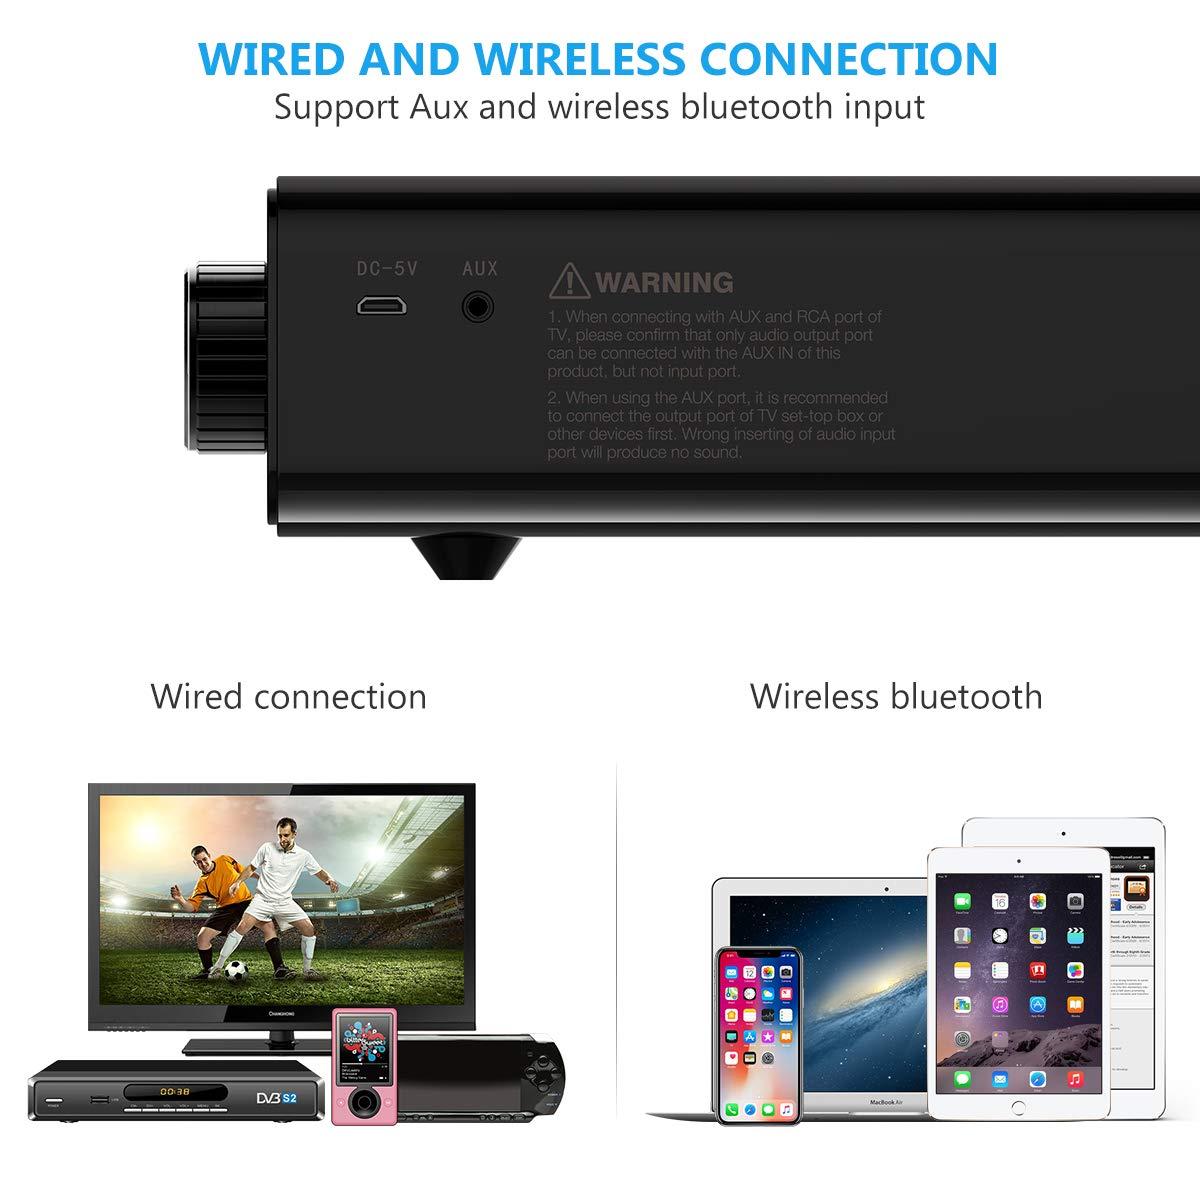 Soundbar, Foxnovo Bluetooth Speaker SoundBar 20W Wired and Wireless  Portable Home Theater Bluetooth Speaker Audio Surround Sound Bar for TV,  PC, Cell